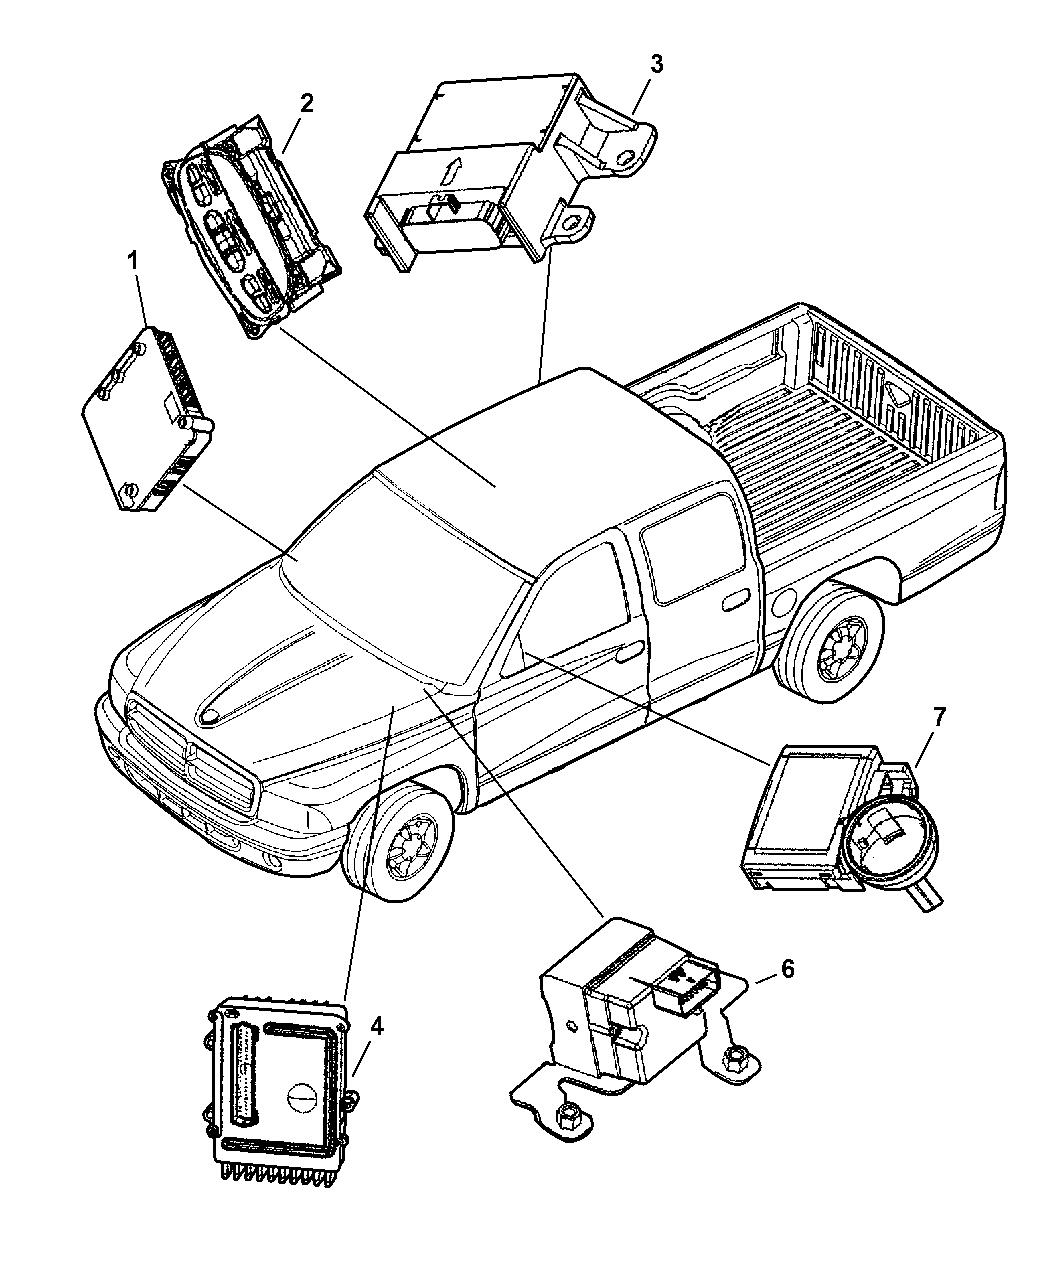 1993 Dodge Ram 50 Regular Cab Transmission: Genuine Dodge MODULE-TIME AND ALARM